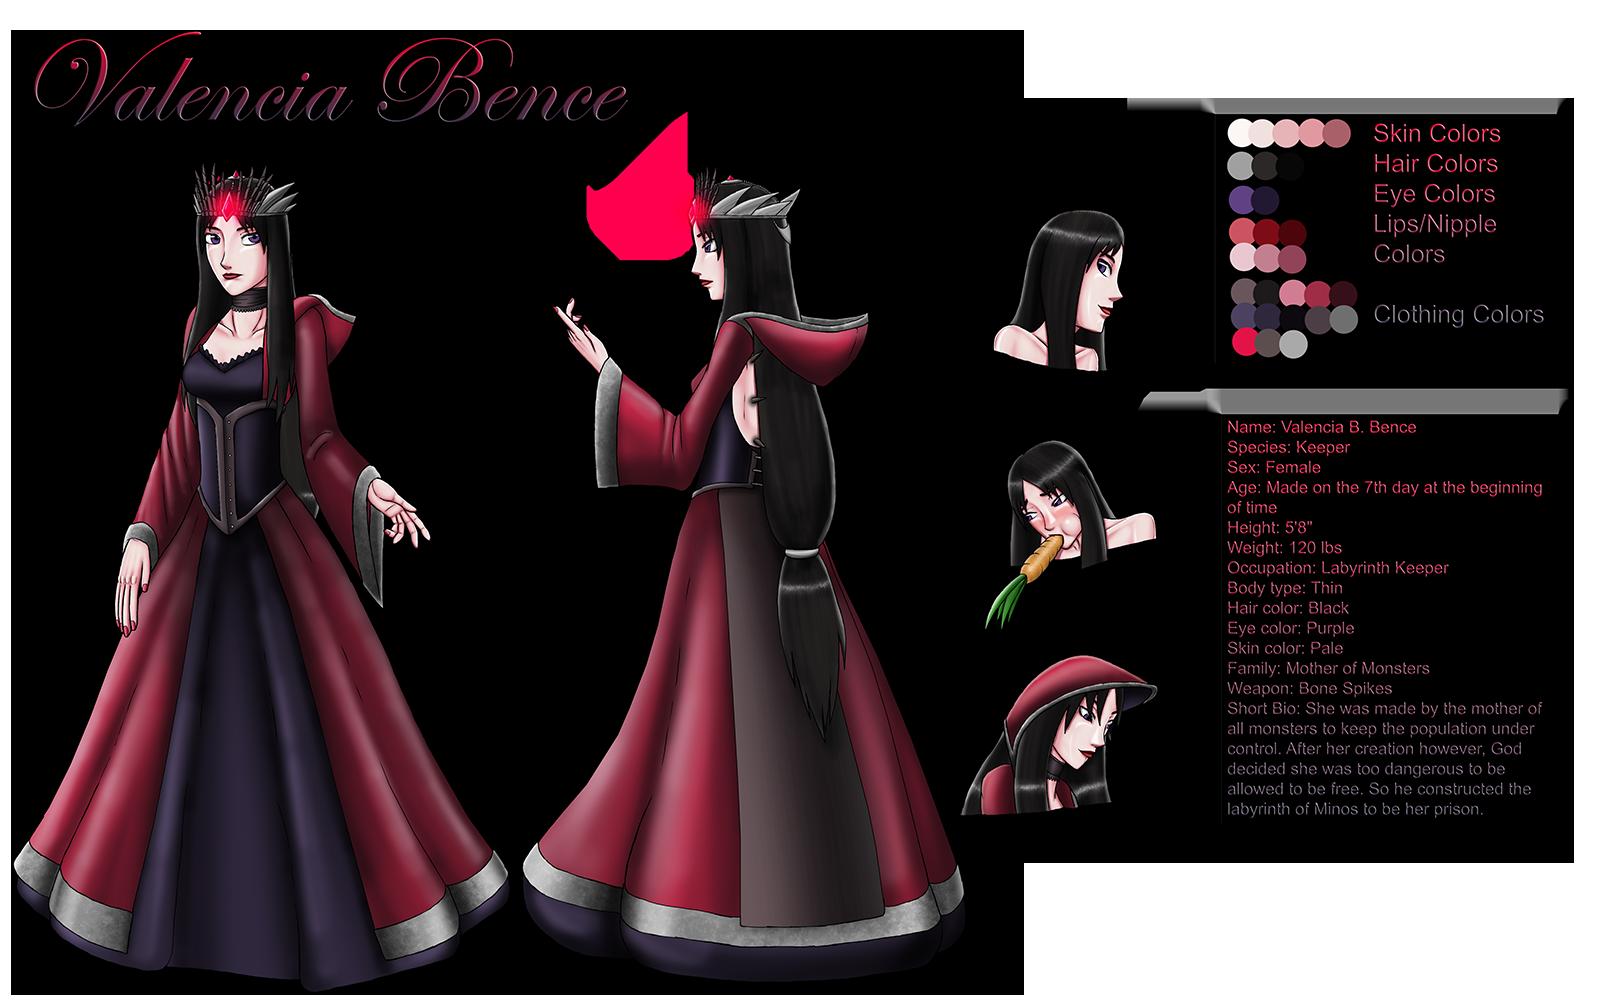 Valencia Bence Character Sheet by NIX